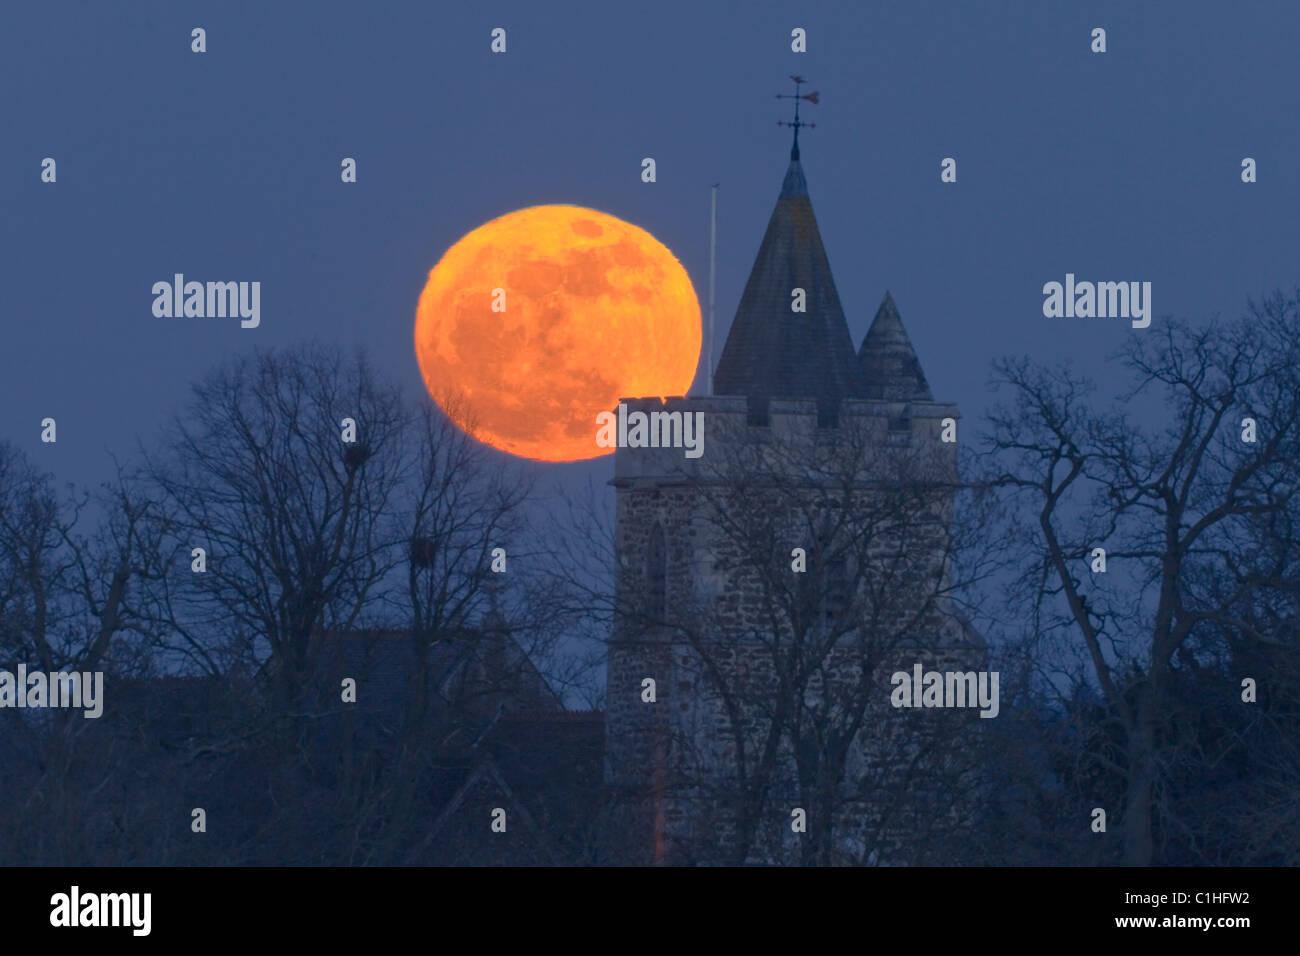 Super moon rise over Warfield Church, Warfield, Bracknell, Berkshire, UK - Stock Image